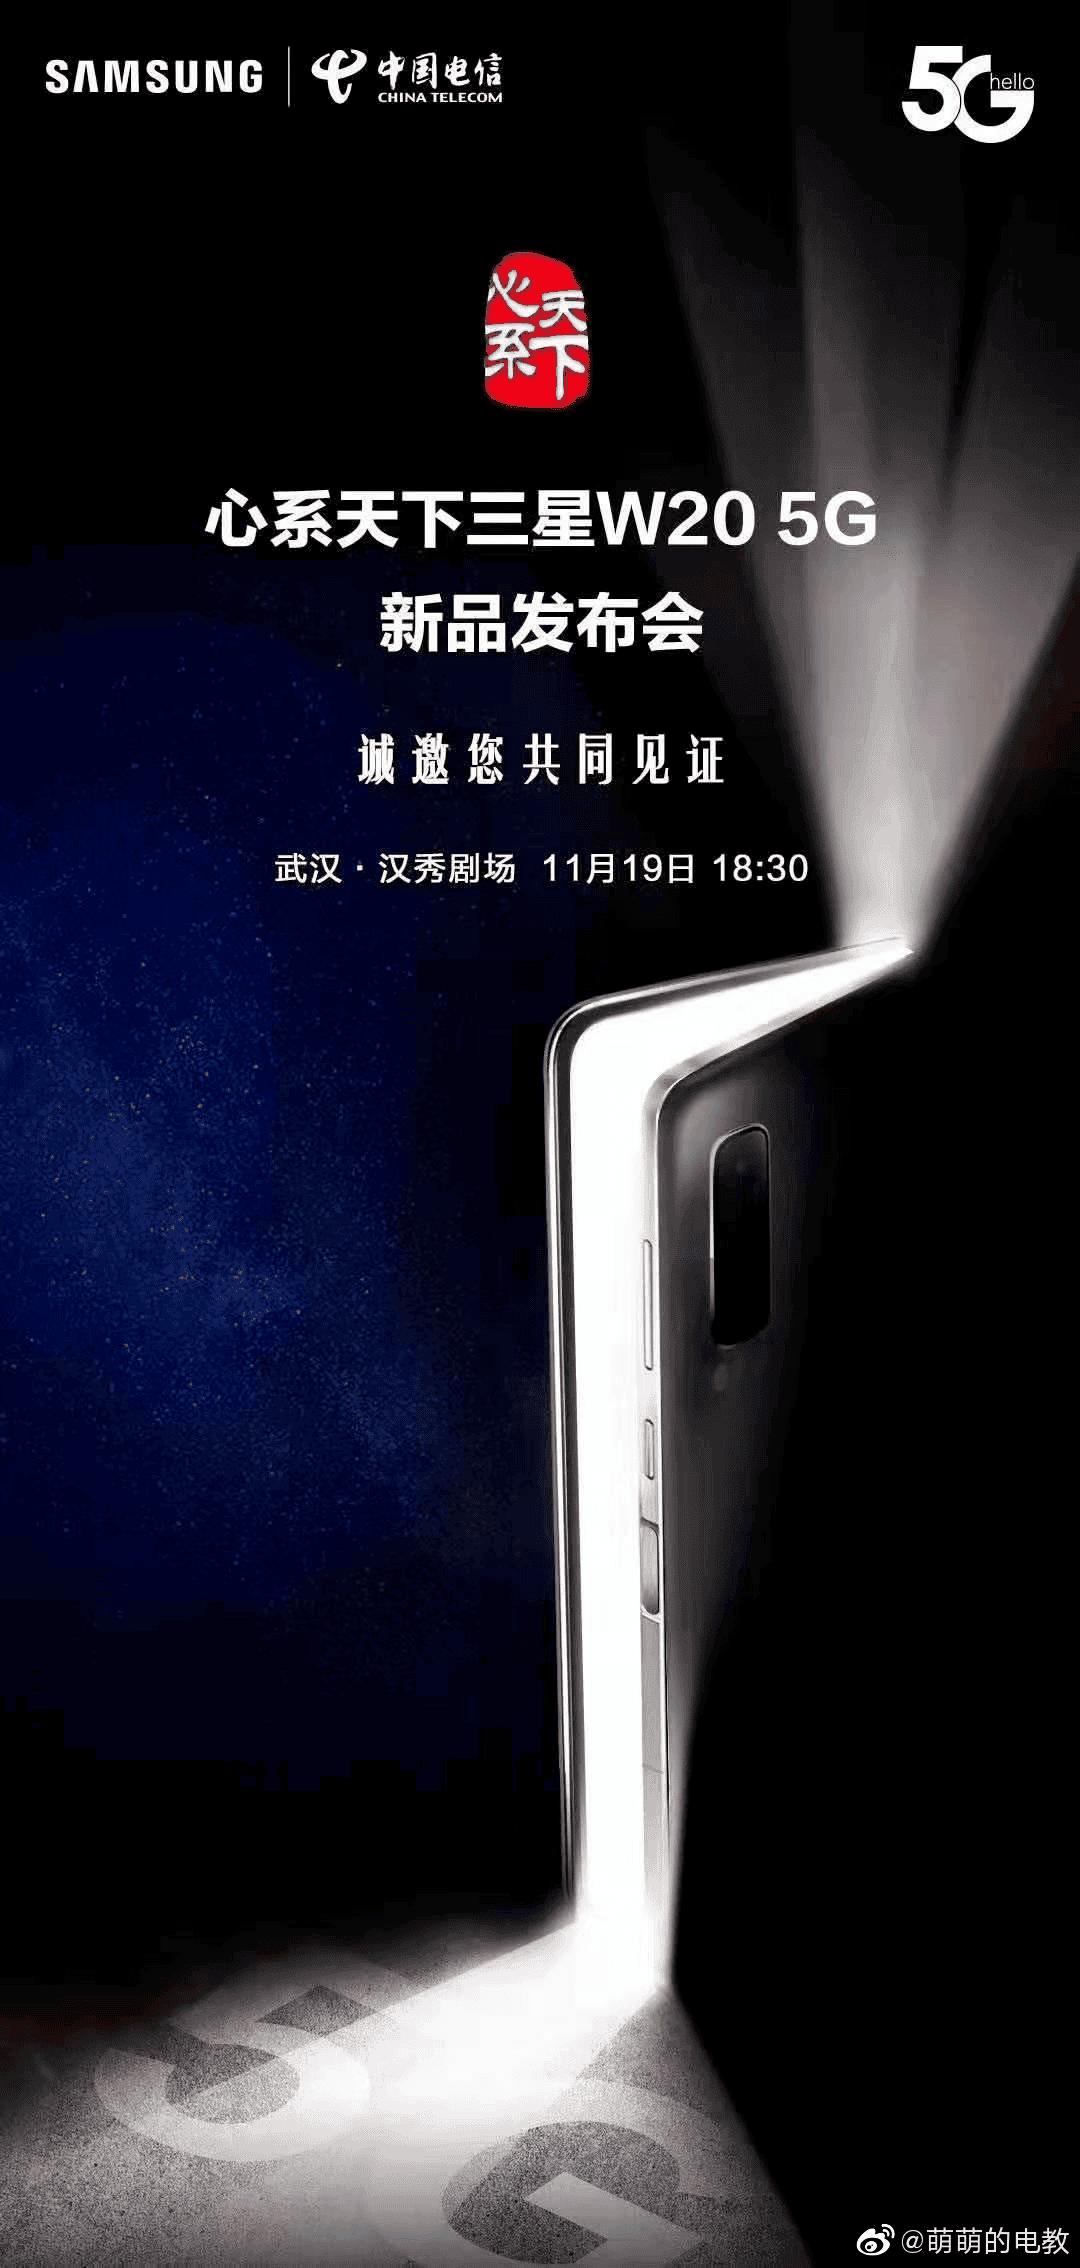 Segundo teléfono plegable de Samsung